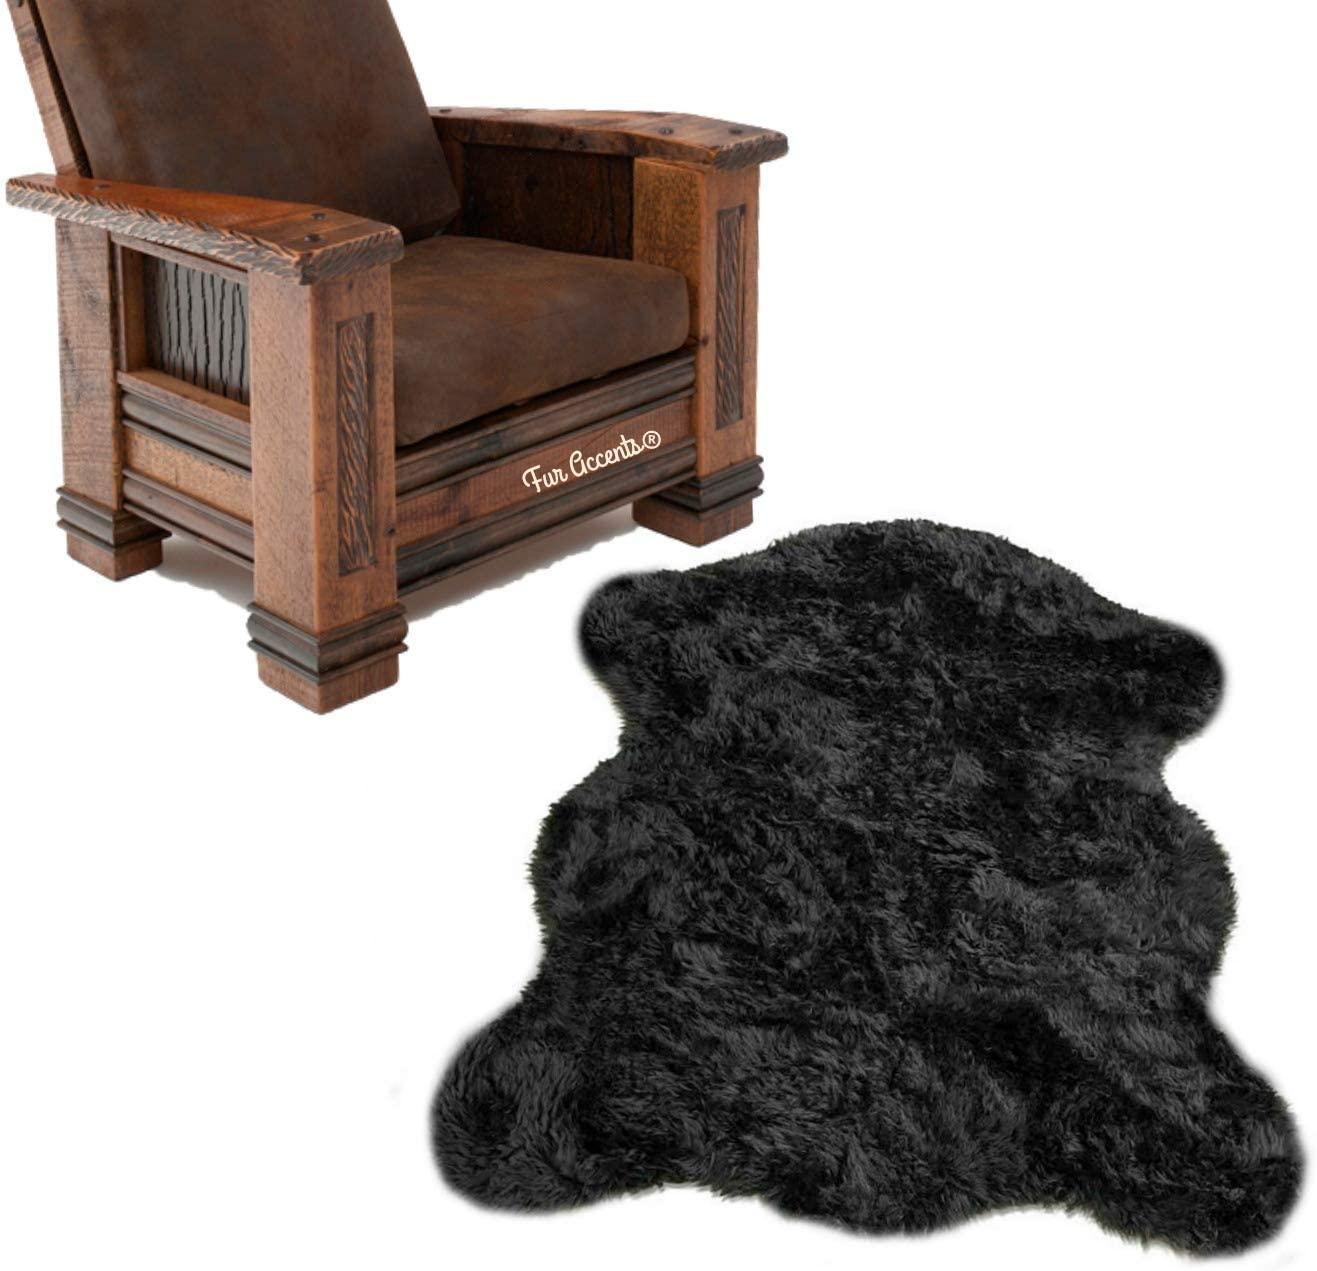 Fur Accents Faux Fur Bear Skin Area Rug, Black Chubby Bear, Shag Rug, Cabin, Lodge, Man Cave, Living Room, Bedroom, Hand Made in America, 4'x5'